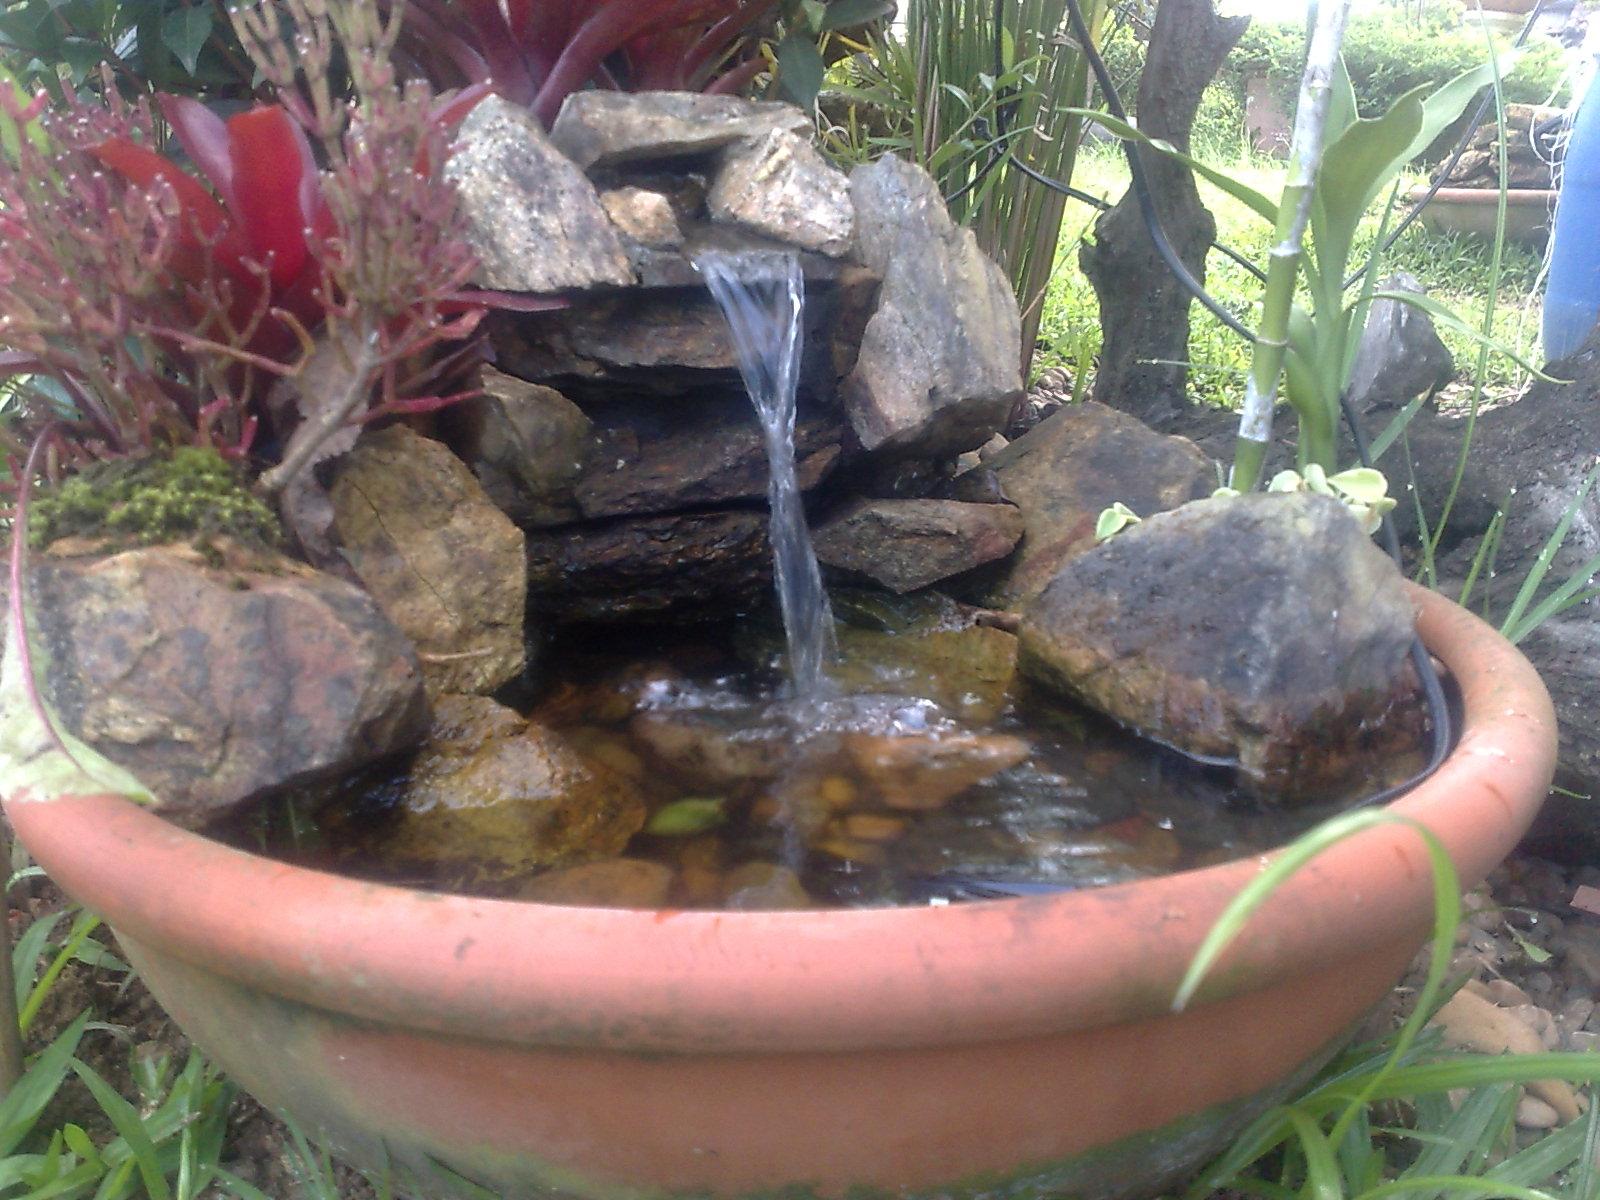 mini jardim acessorios:venda de plantas e acessorios para jardim